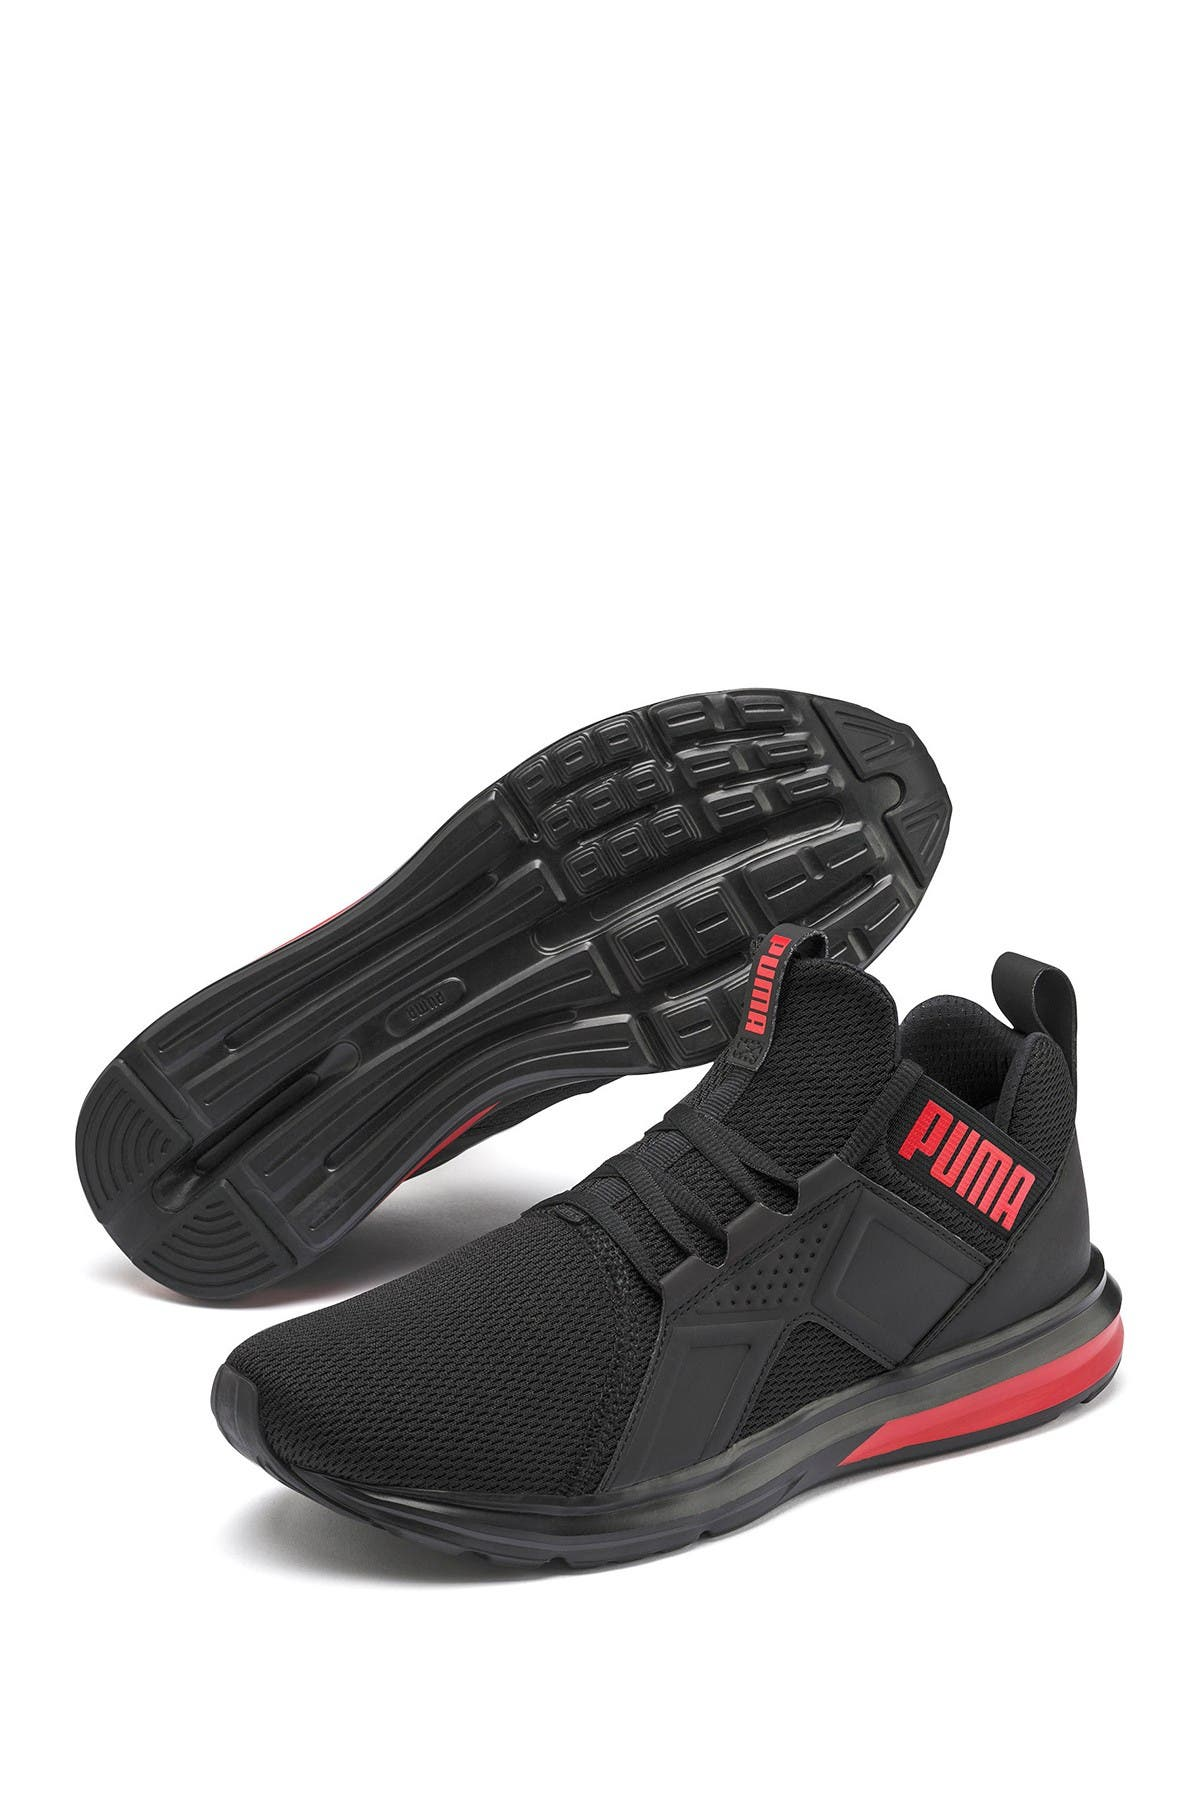 Image of PUMA Enzo Sport Running Shoe